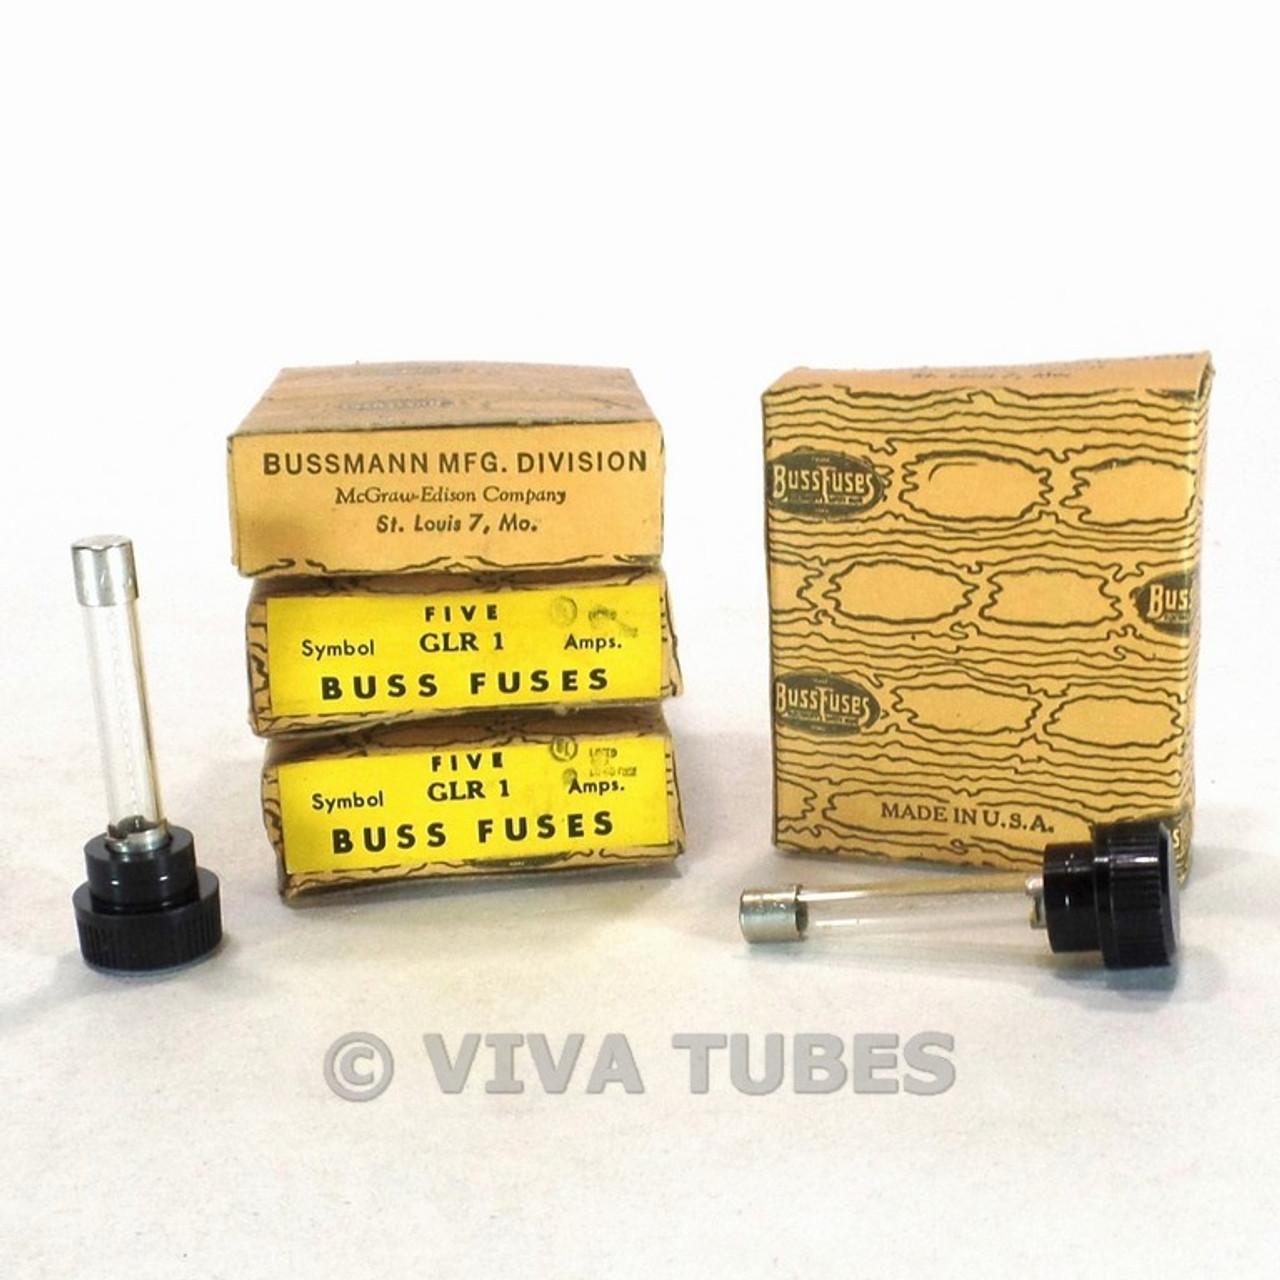 medium resolution of lot of 20 nos nib bussman fuses glr 1 a 300 v panel mount fuse holder tube amps viva tubes